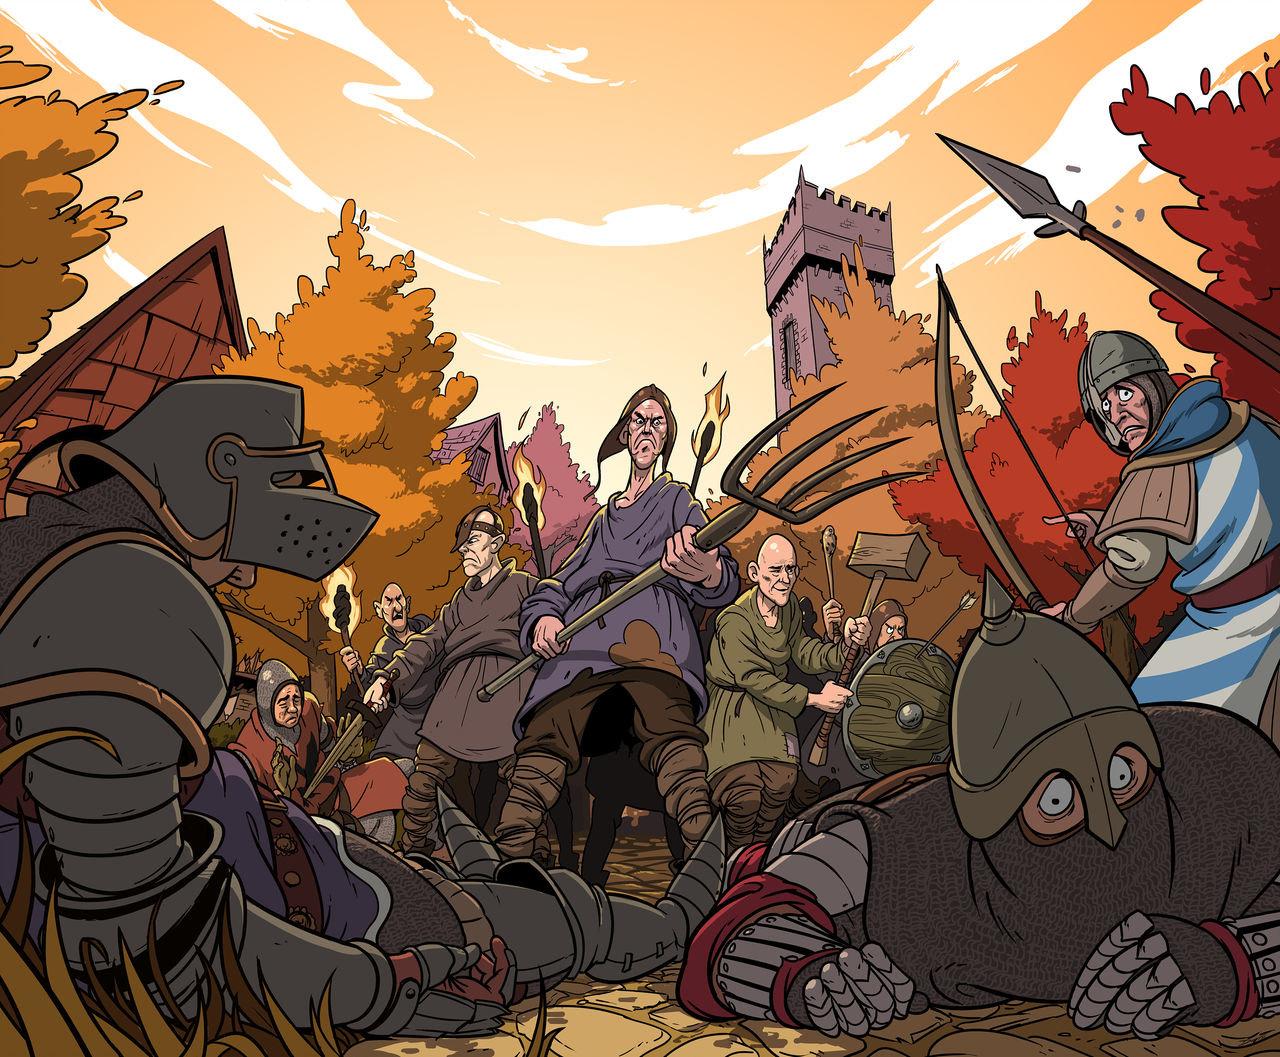 peasant_s_revolt_by_angusburgers_d9d7cuo-fullview.jpg.c2d1510559f53b618b98af6bcc2c567e.jpg